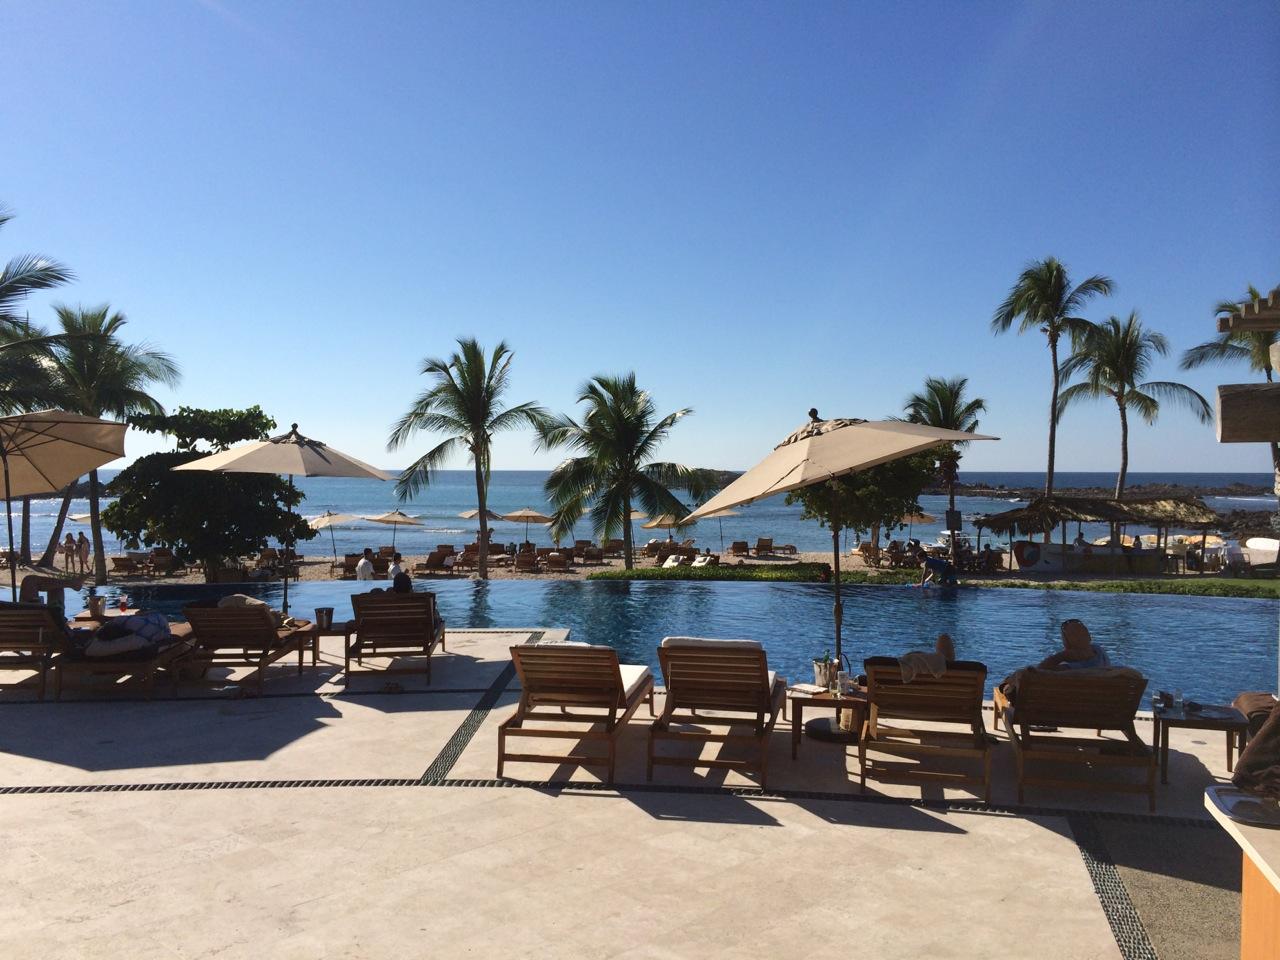 Flying to Mexico – San Diego to Puerto Vallarta